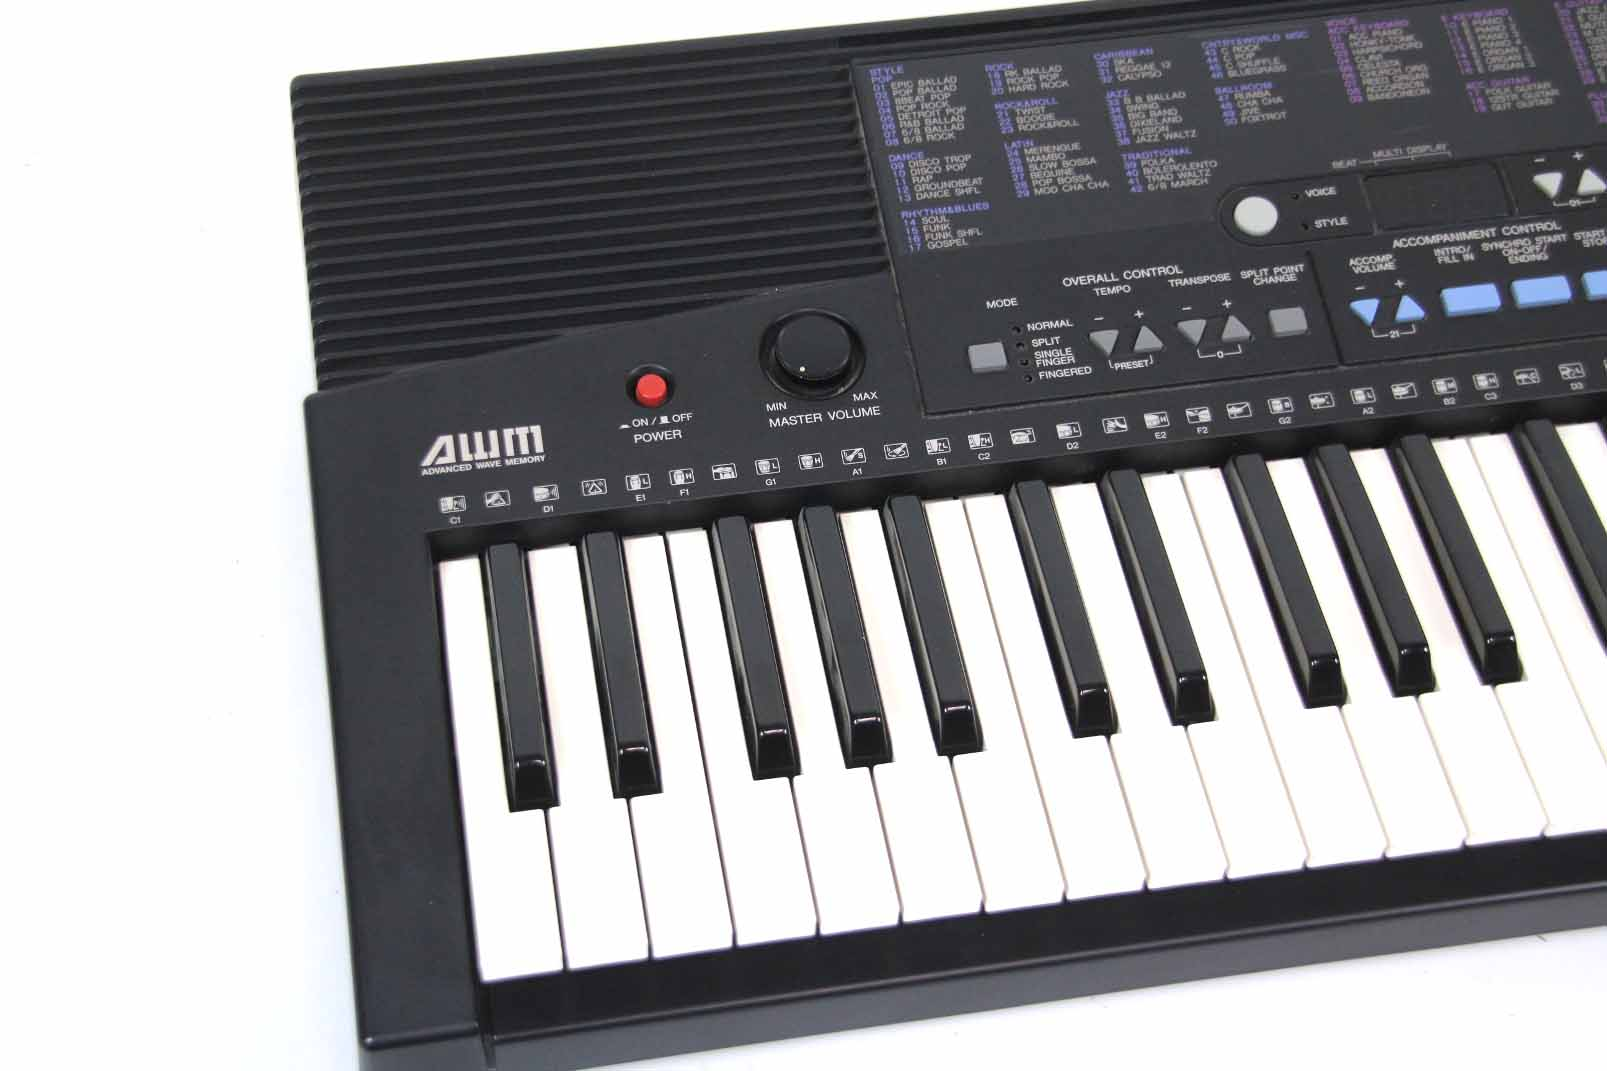 yamaha psr 210 keyboard 61 tasten anschlagdynamik 100. Black Bedroom Furniture Sets. Home Design Ideas